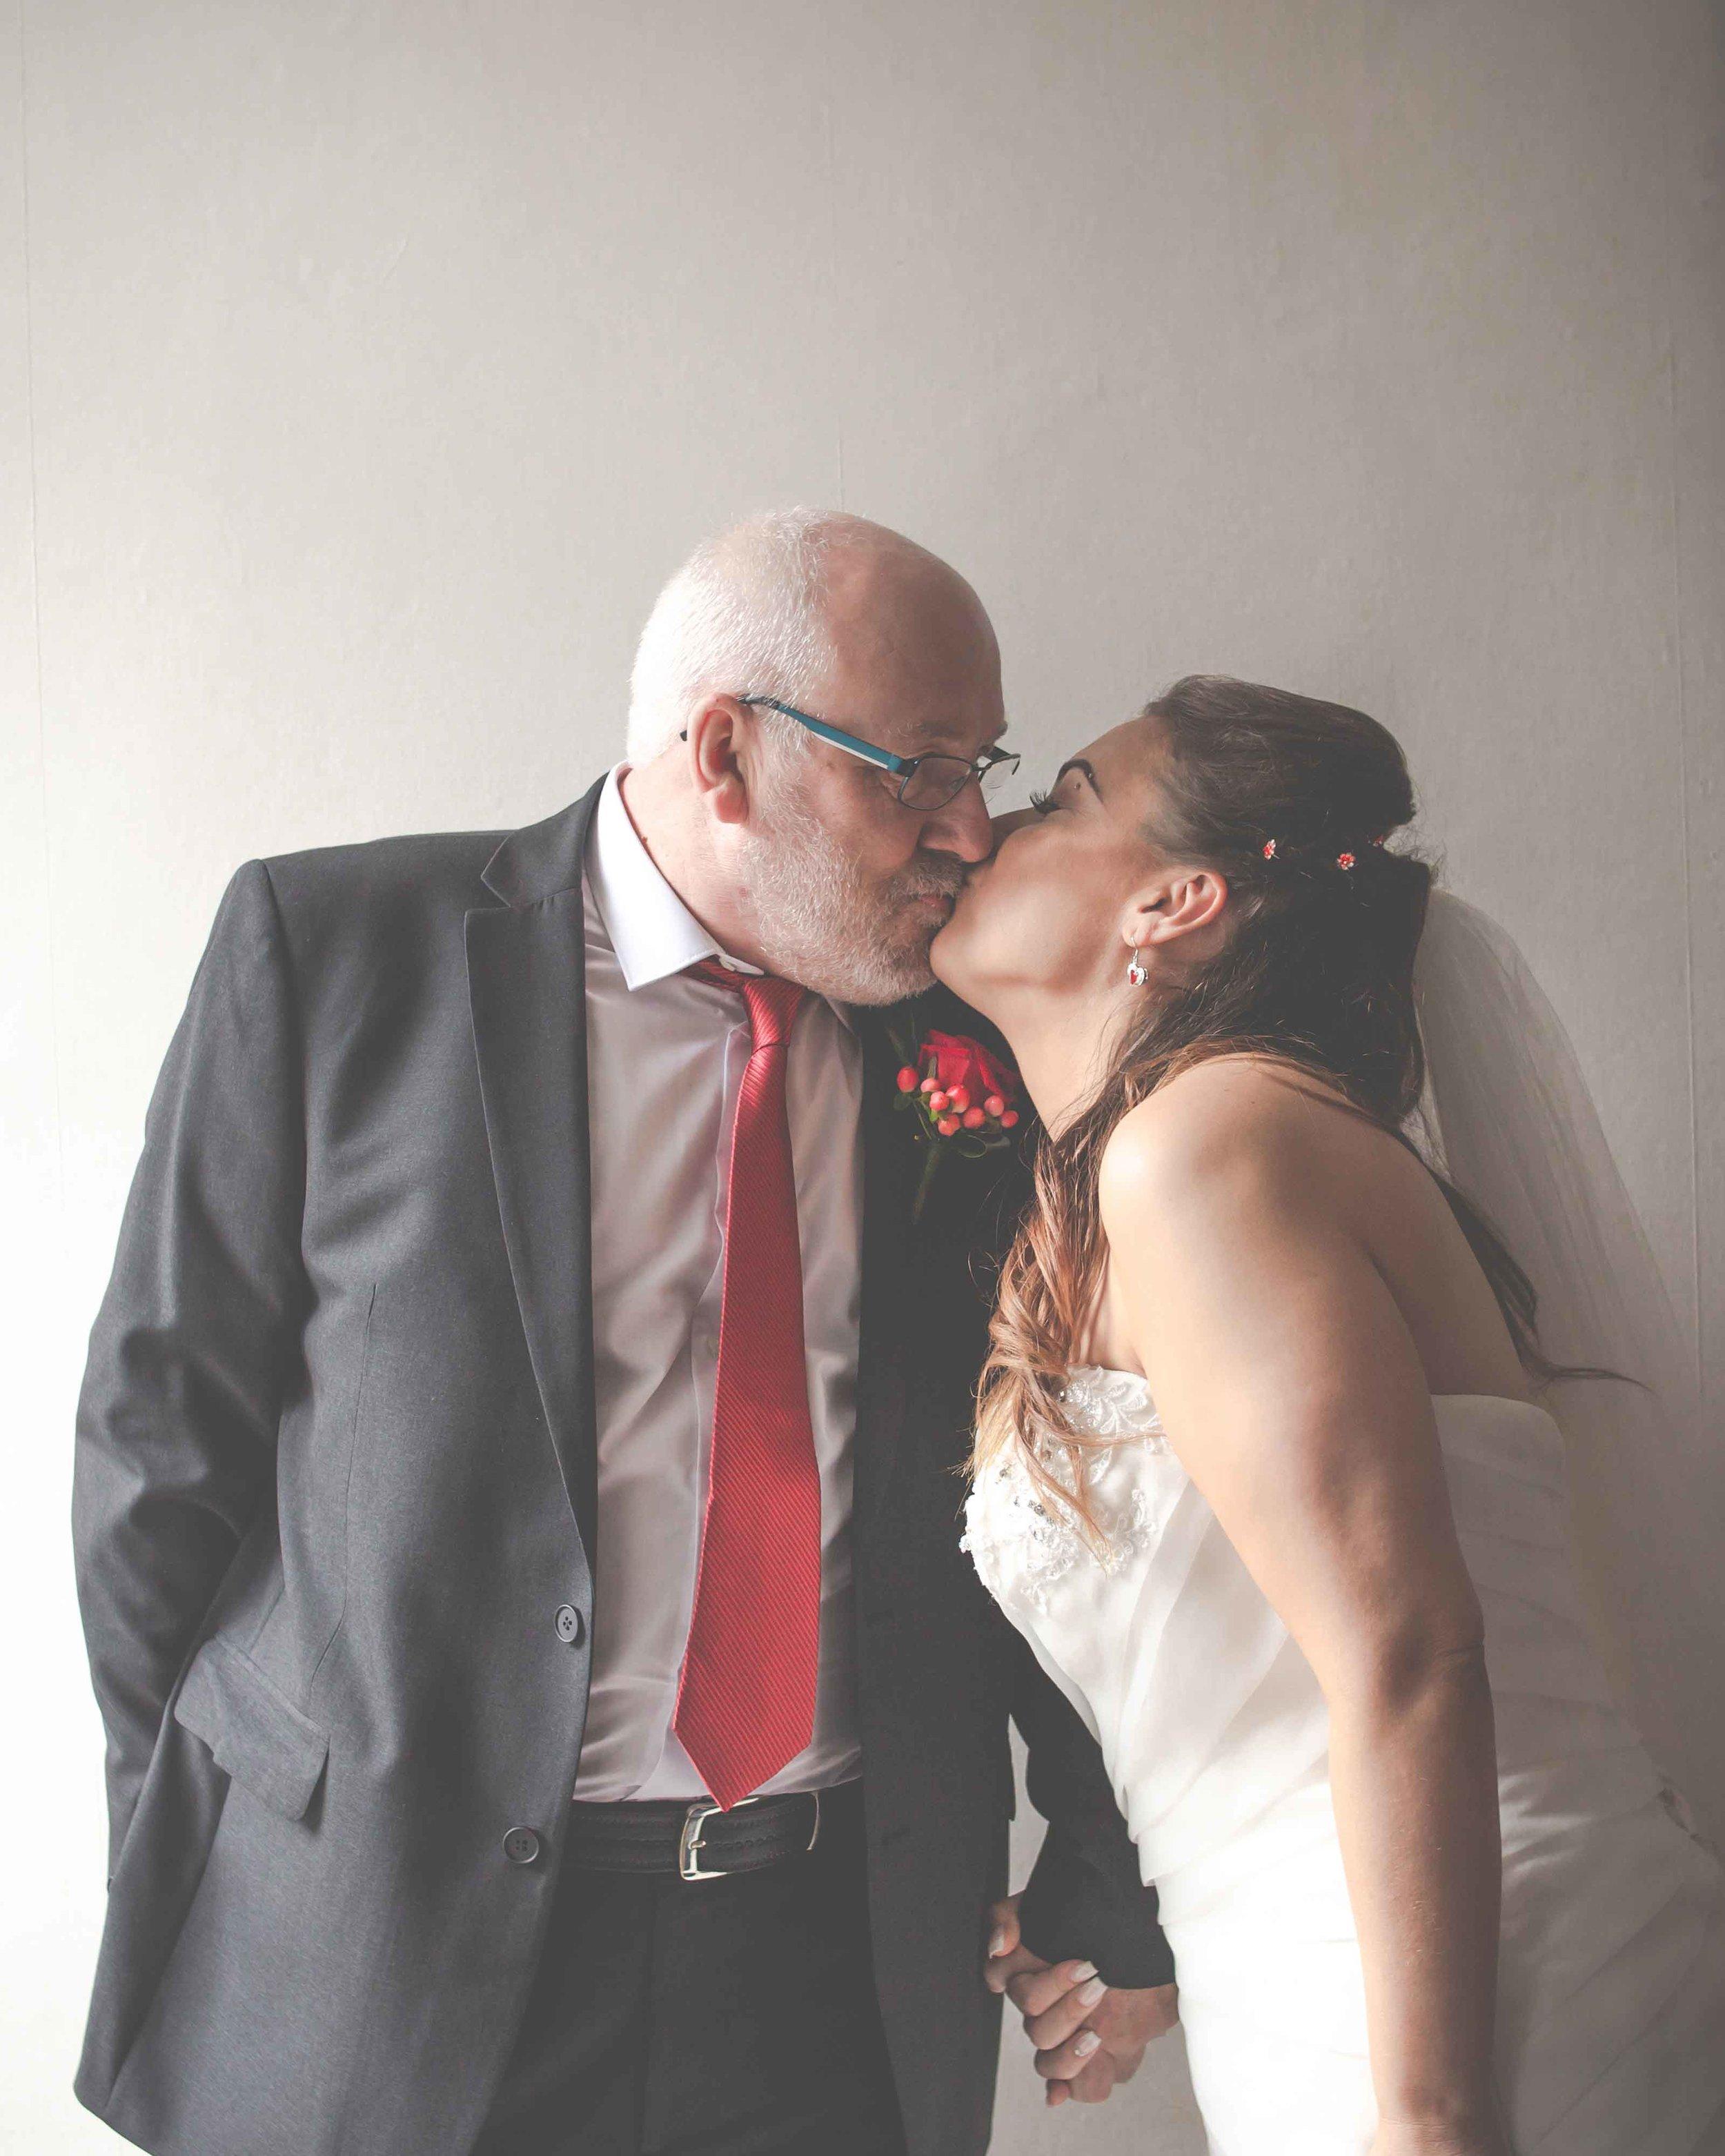 st-johns-ingrow-keighley-wedding-photos-08